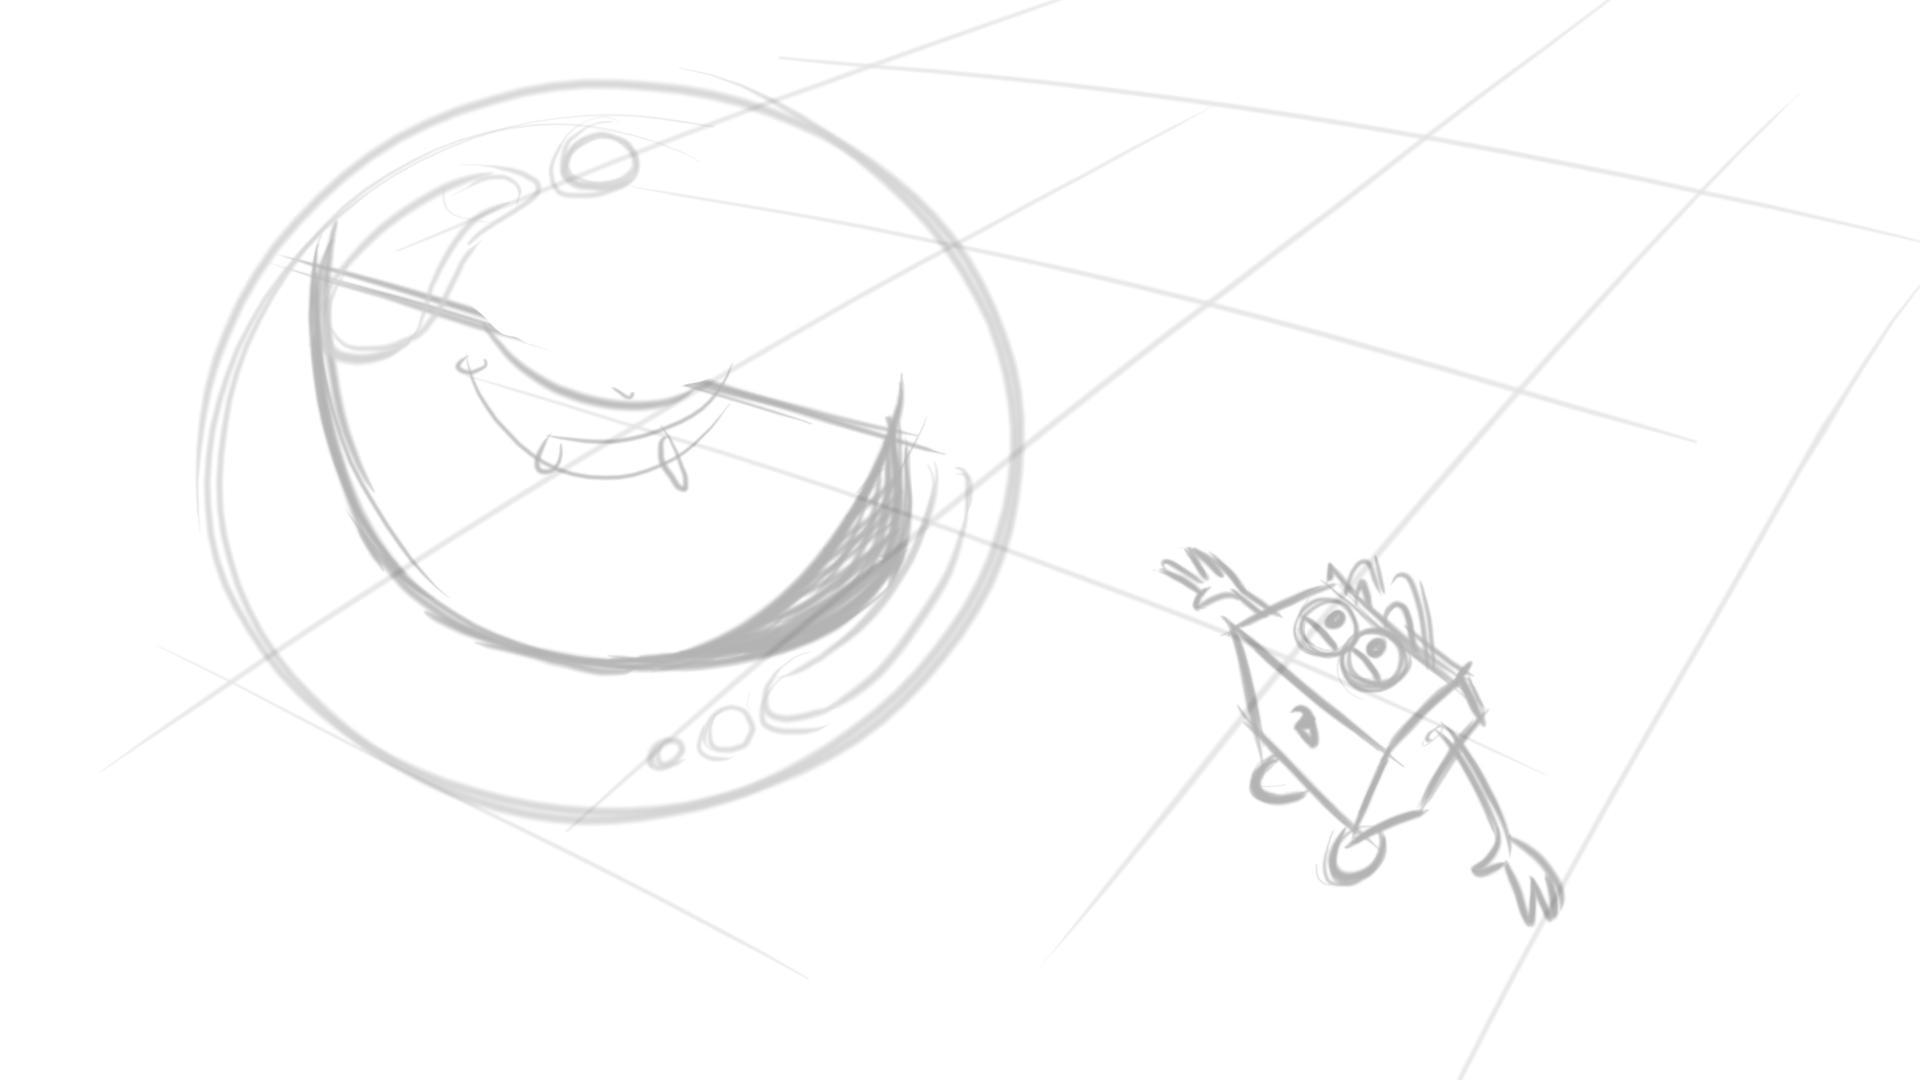 Mario-03-03.jpg